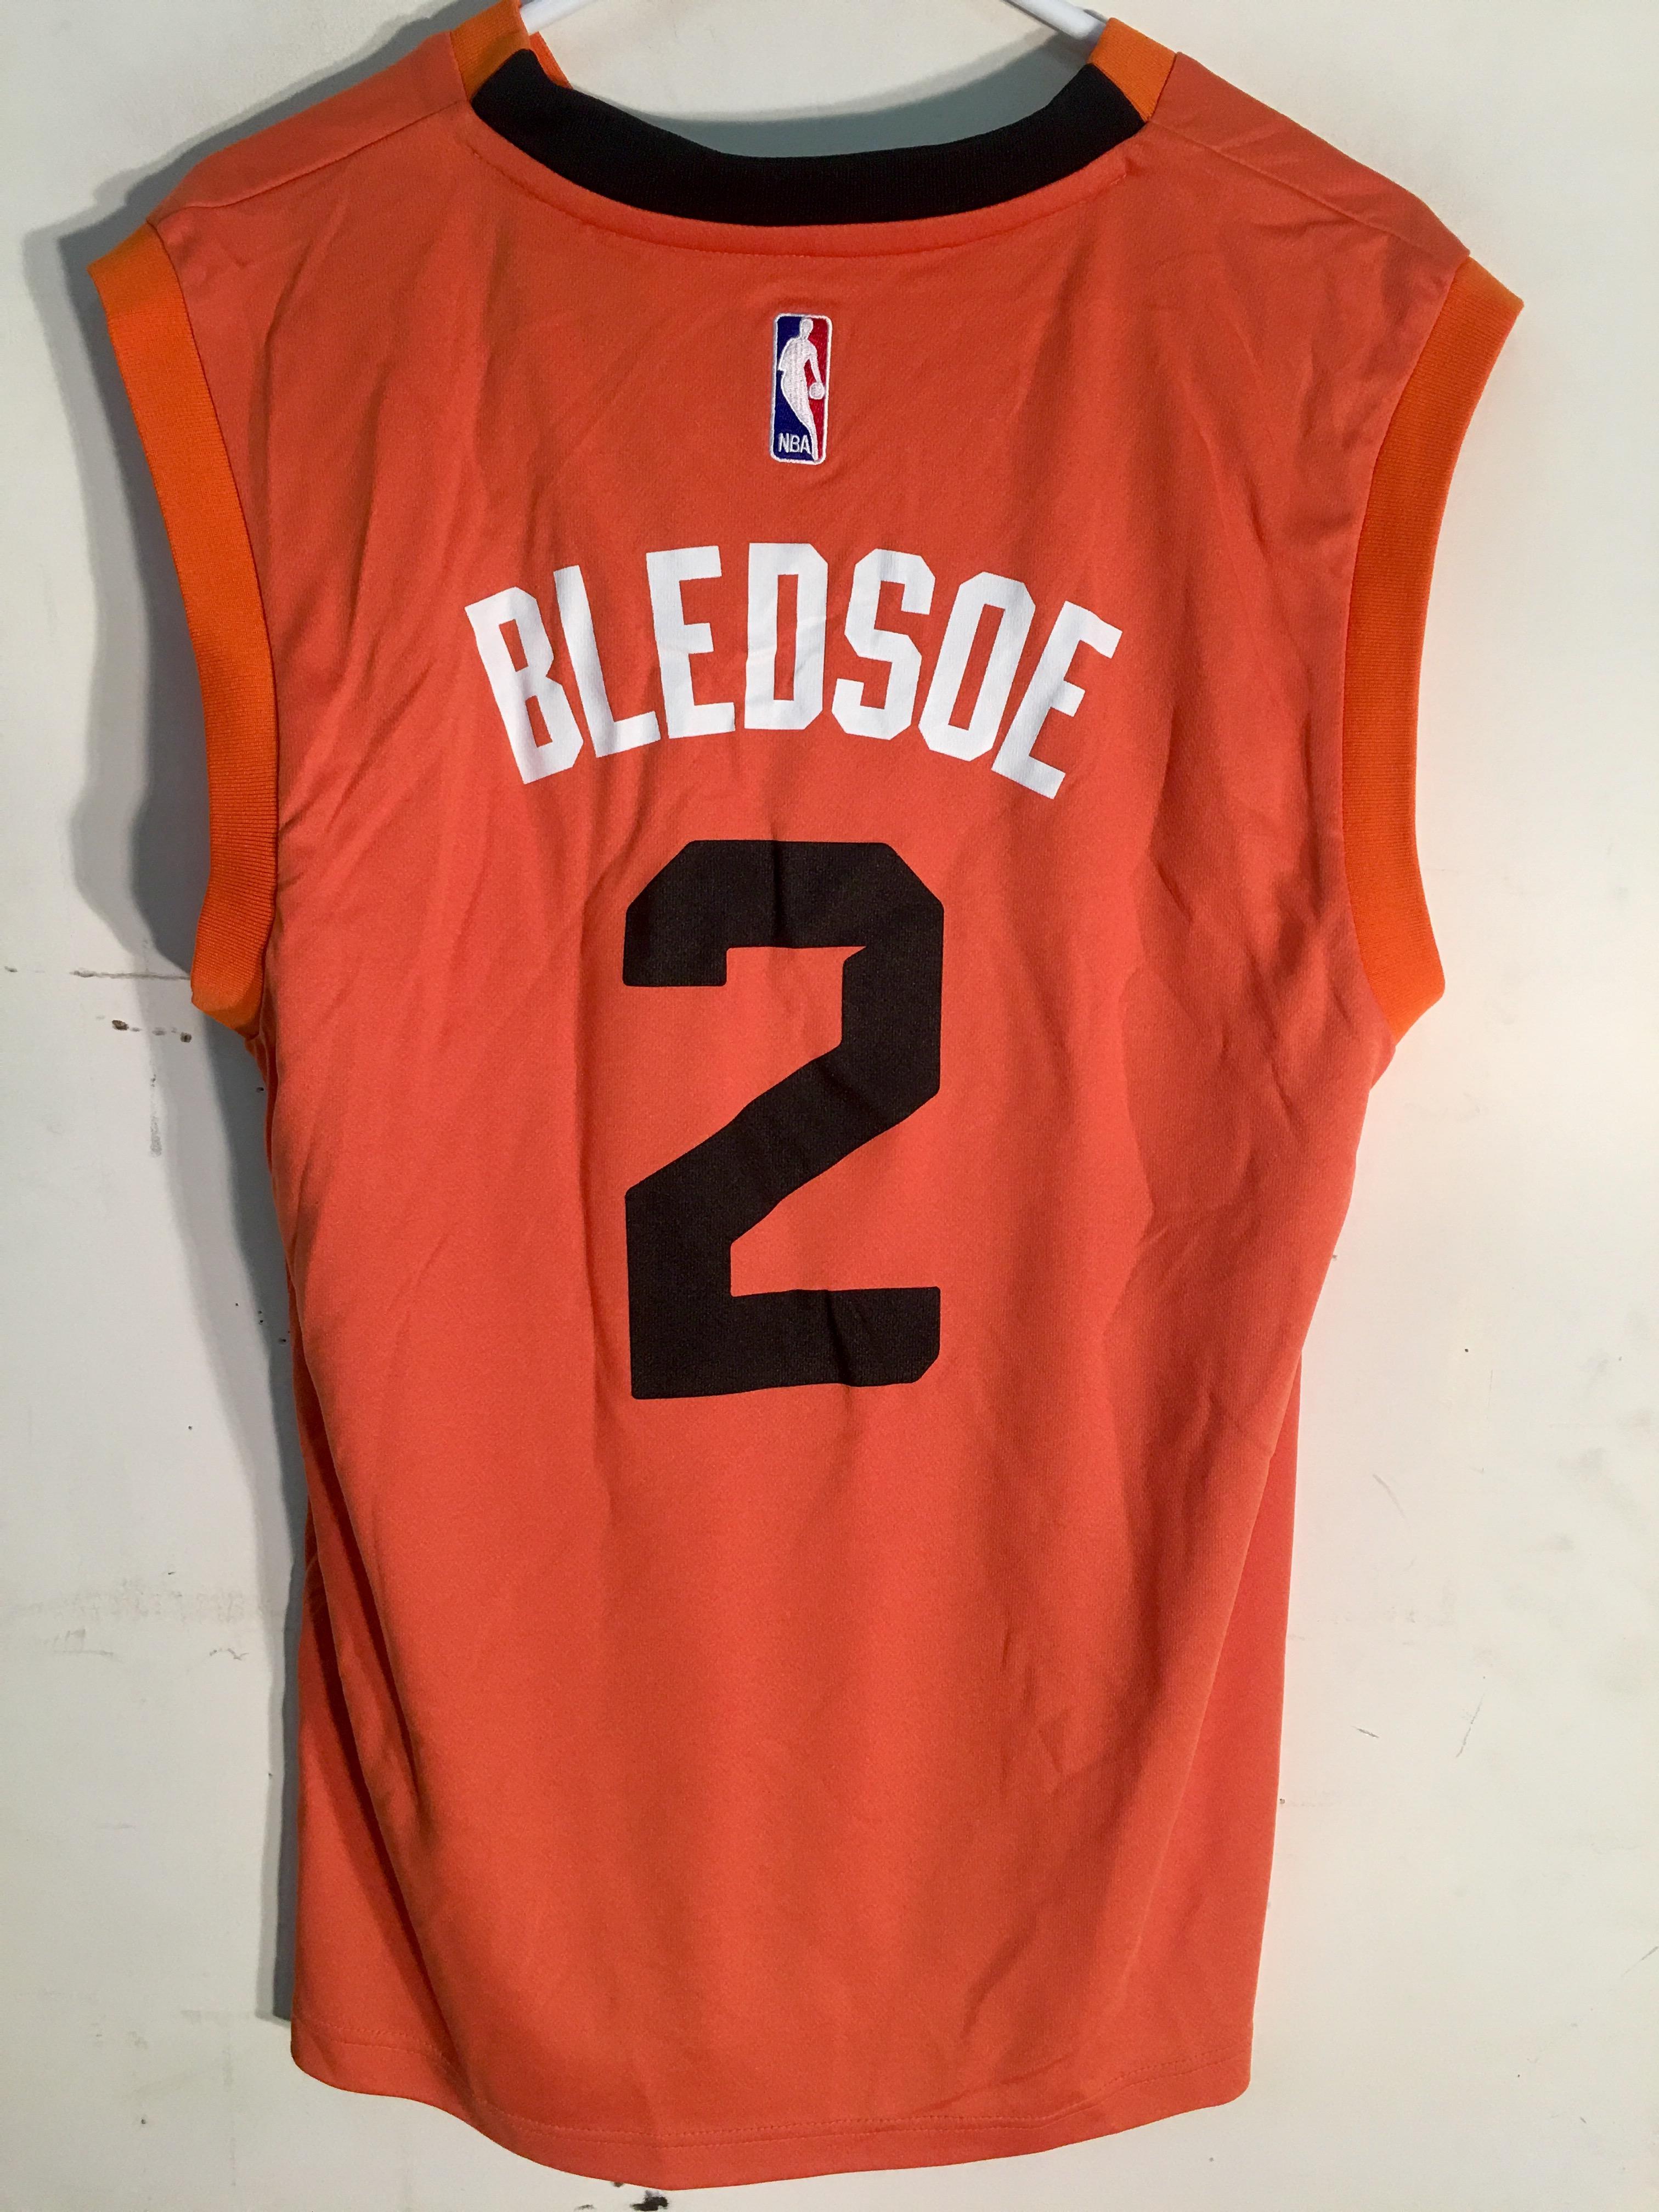 22d365b3fdcd ... reduced details about adidas nba jersey phoenix suns eric bledsoe orange  sz 2x a4855 6ec54